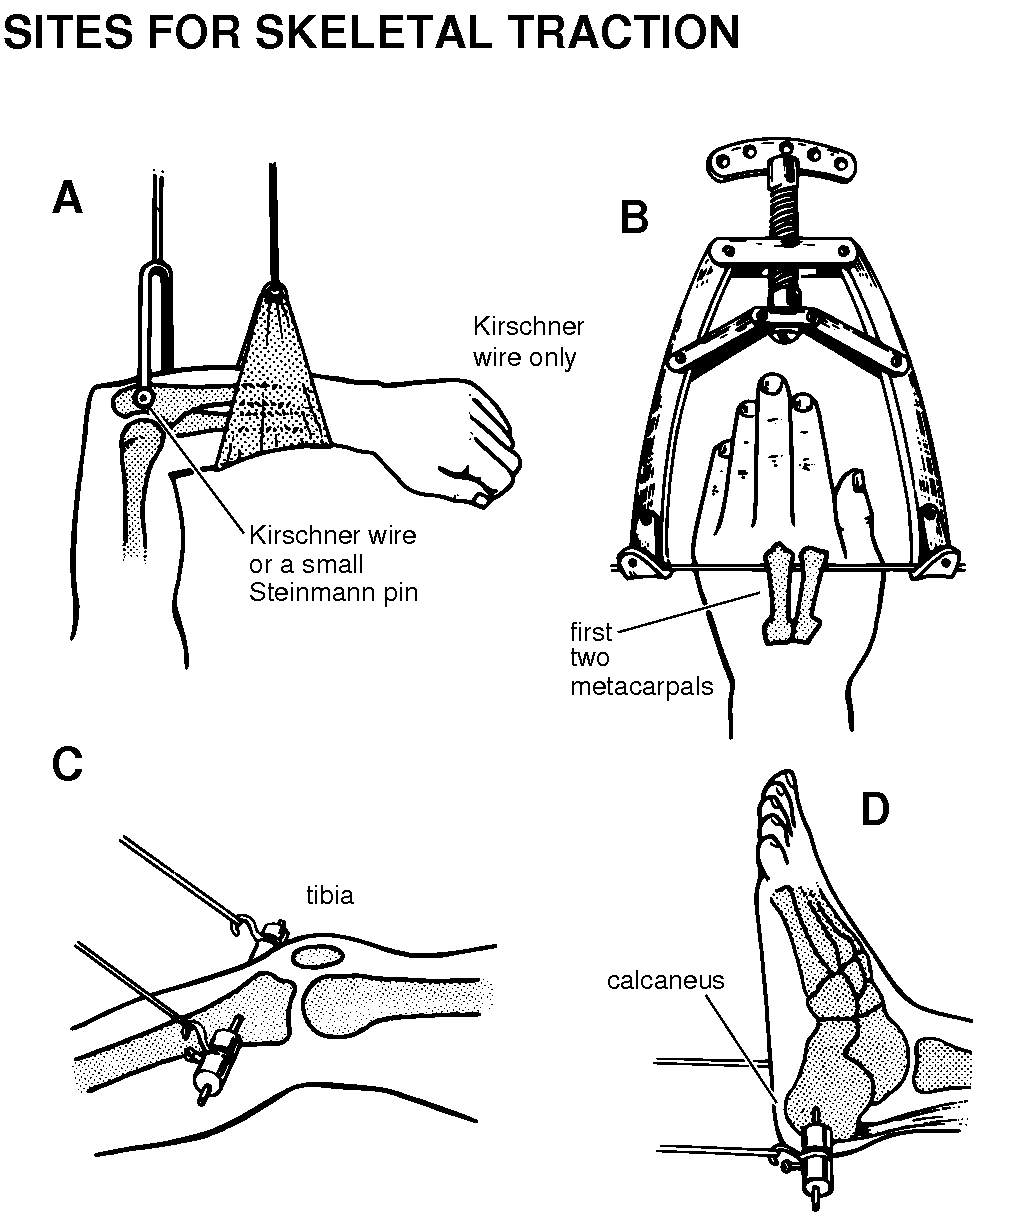 Fractures Skeletal Traction